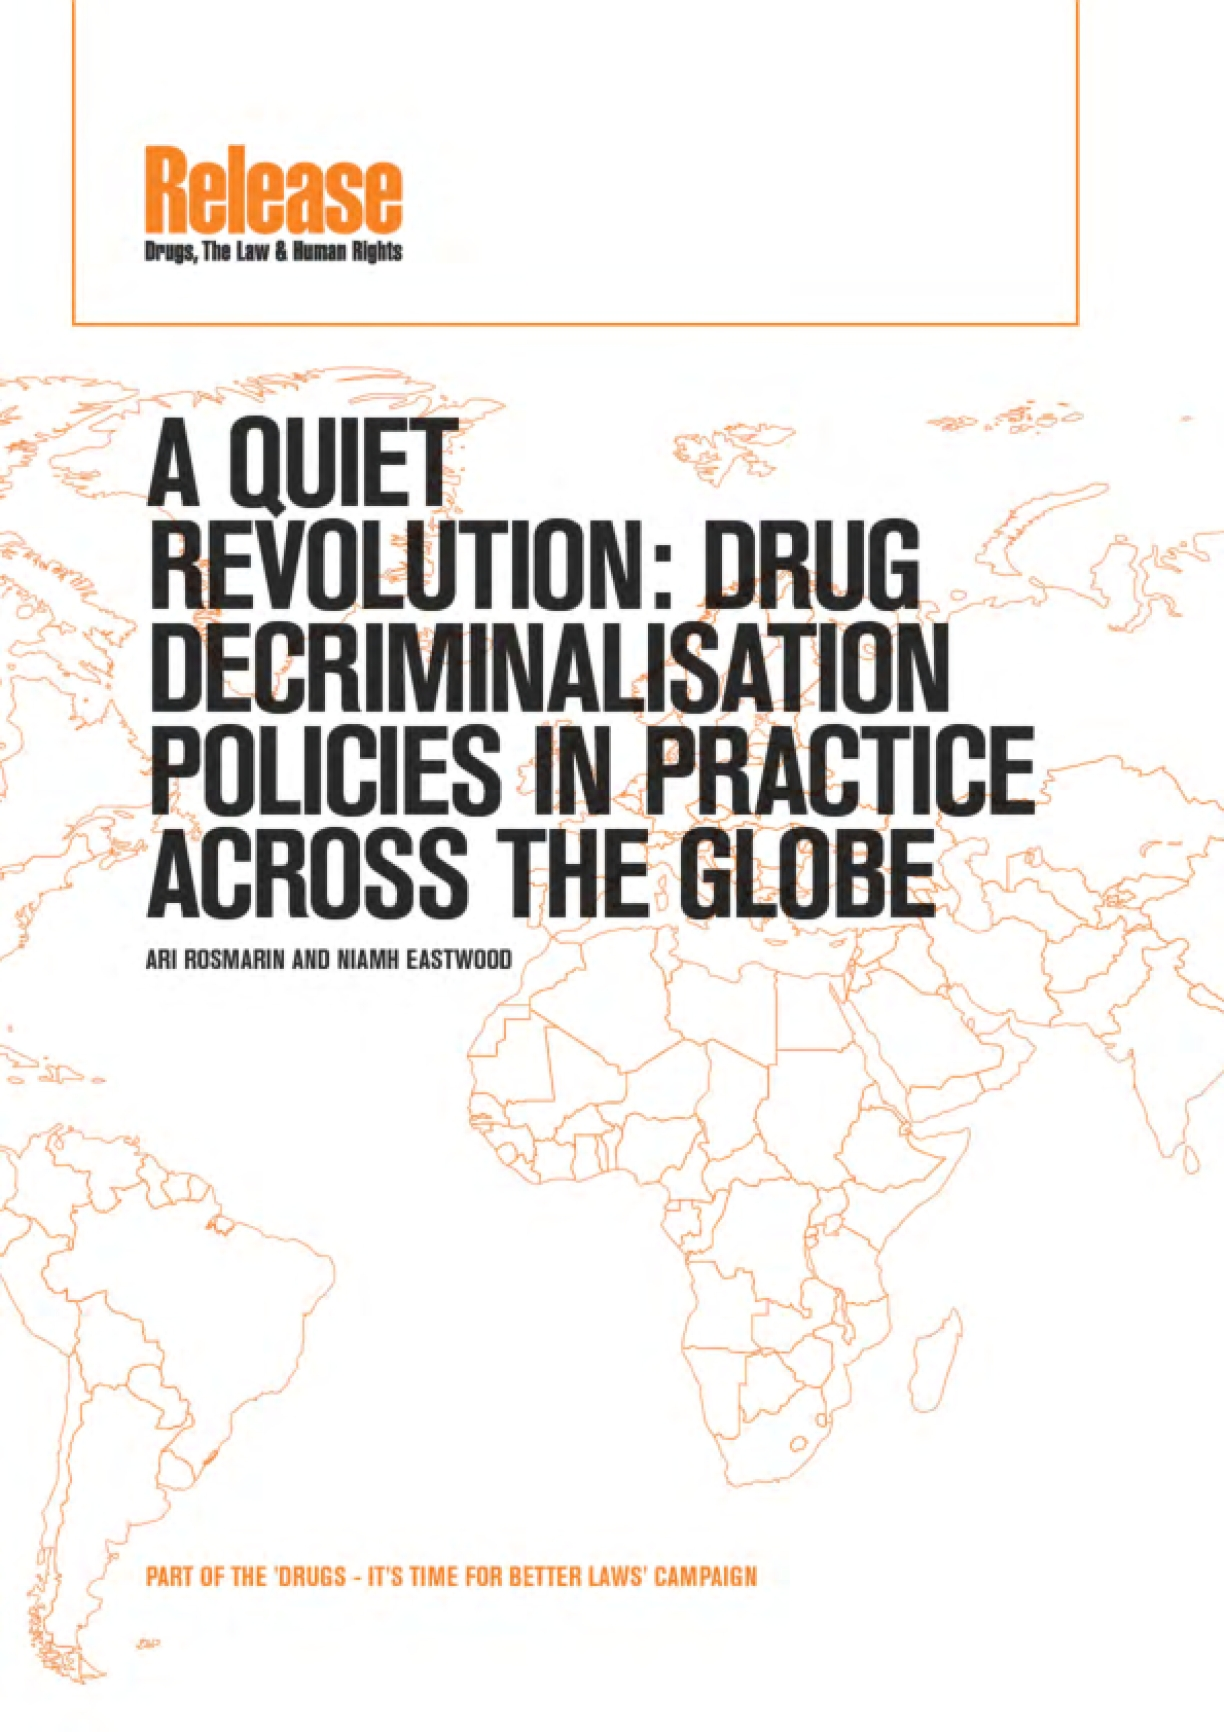 A Quiet Revolution: Drug Decriminalisation Policies in Practice Across the Globe